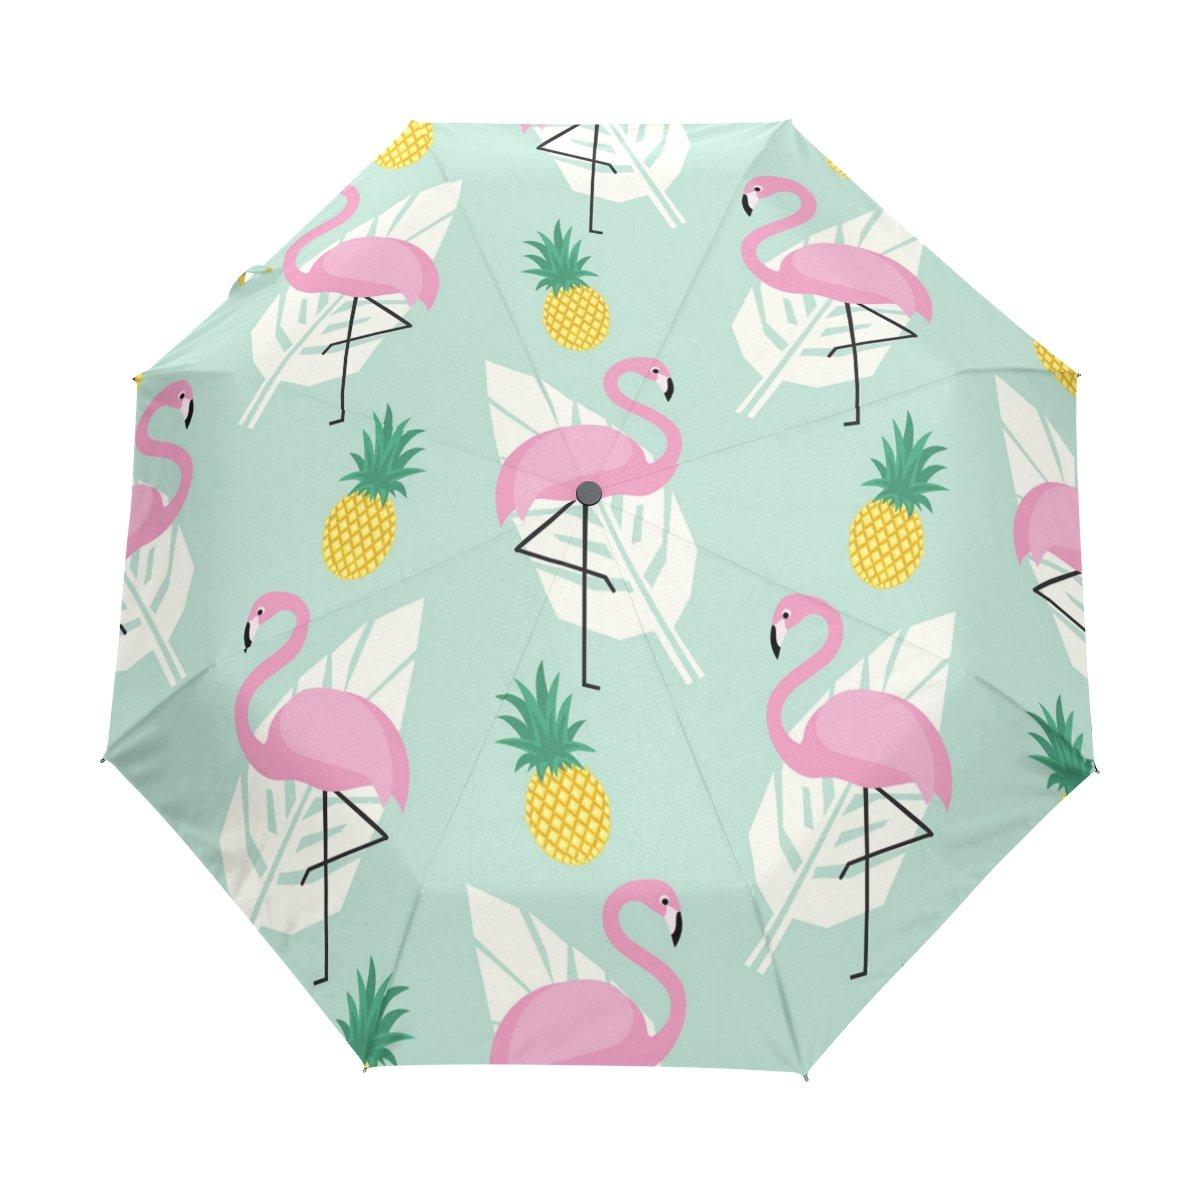 Senya Saobao防風と防雨トラベル傘自動開いて閉じパイナップル折りたたみピンクフラミンゴとヤシの葉ポータブル折りたたみ式太陽雨傘 B07FDVR1GV